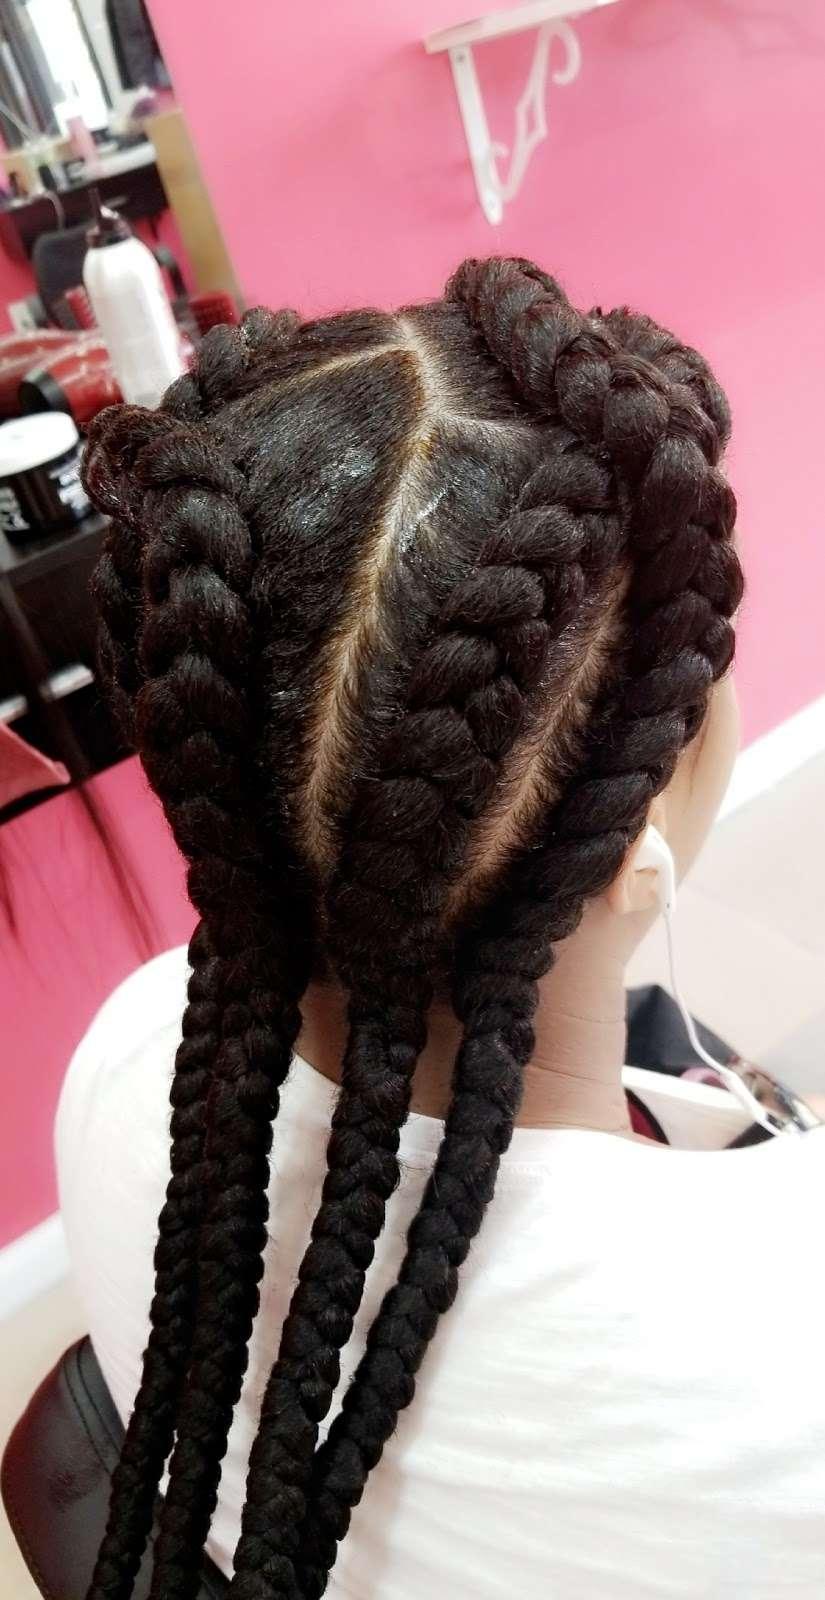 Mama African Hair Braiding - hair care  | Photo 7 of 10 | Address: 162 Rockaway Ave, Brooklyn, NY 11233, USA | Phone: (718) 635-1543